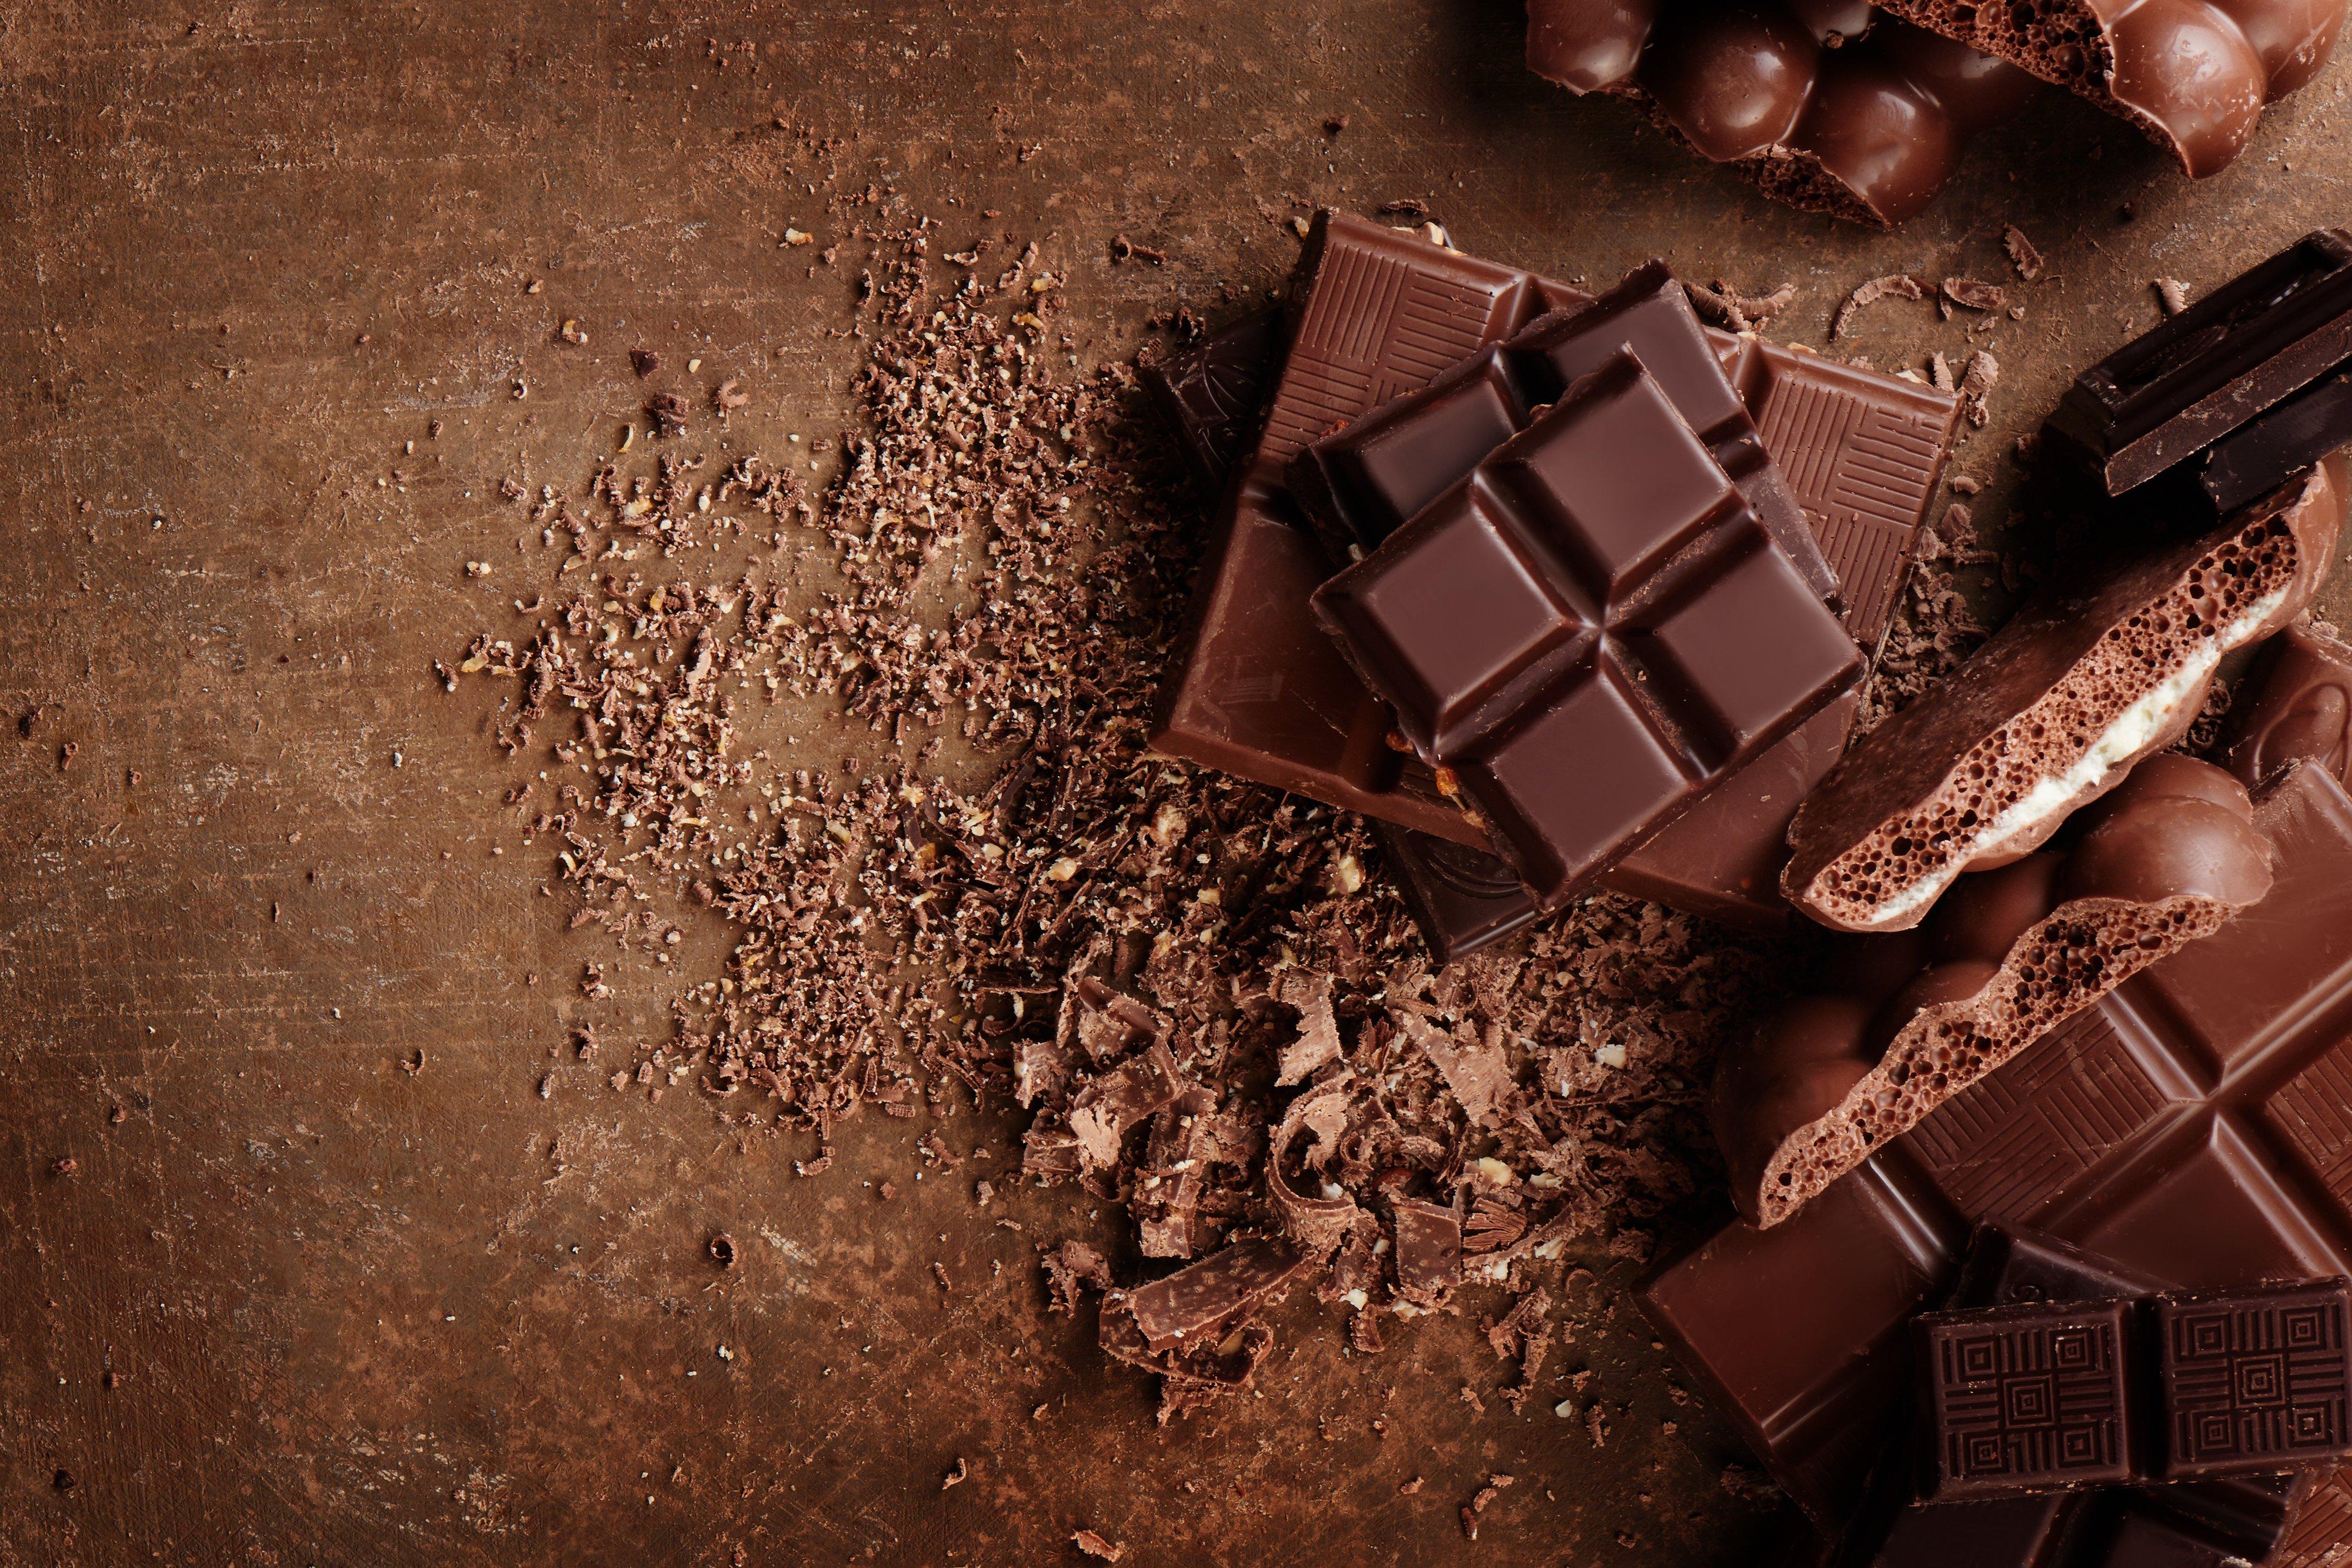 chocolate and chocolate over chocolate